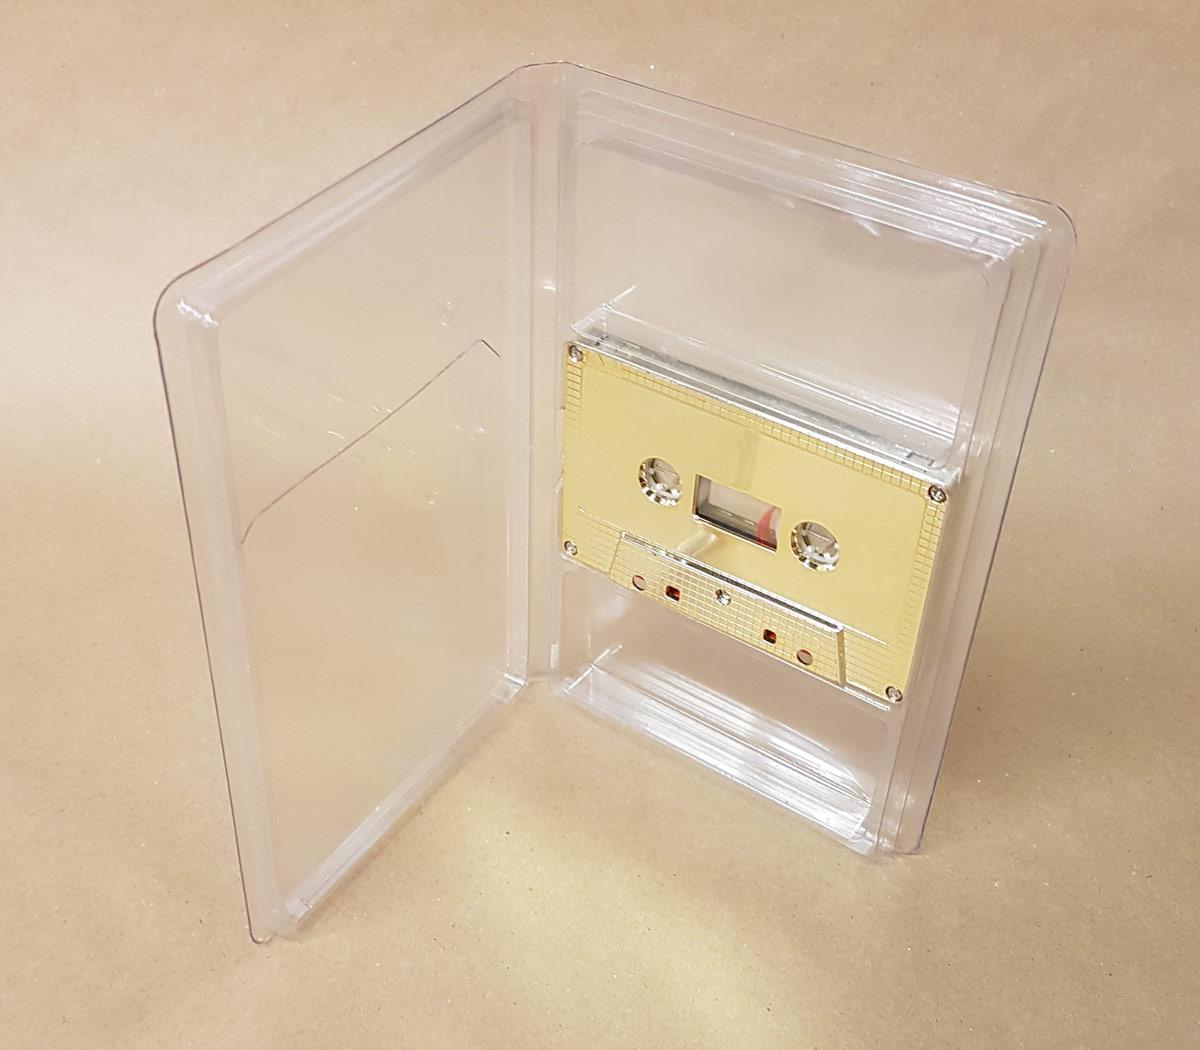 Clear Vinyl Tape Album Case - New Stock